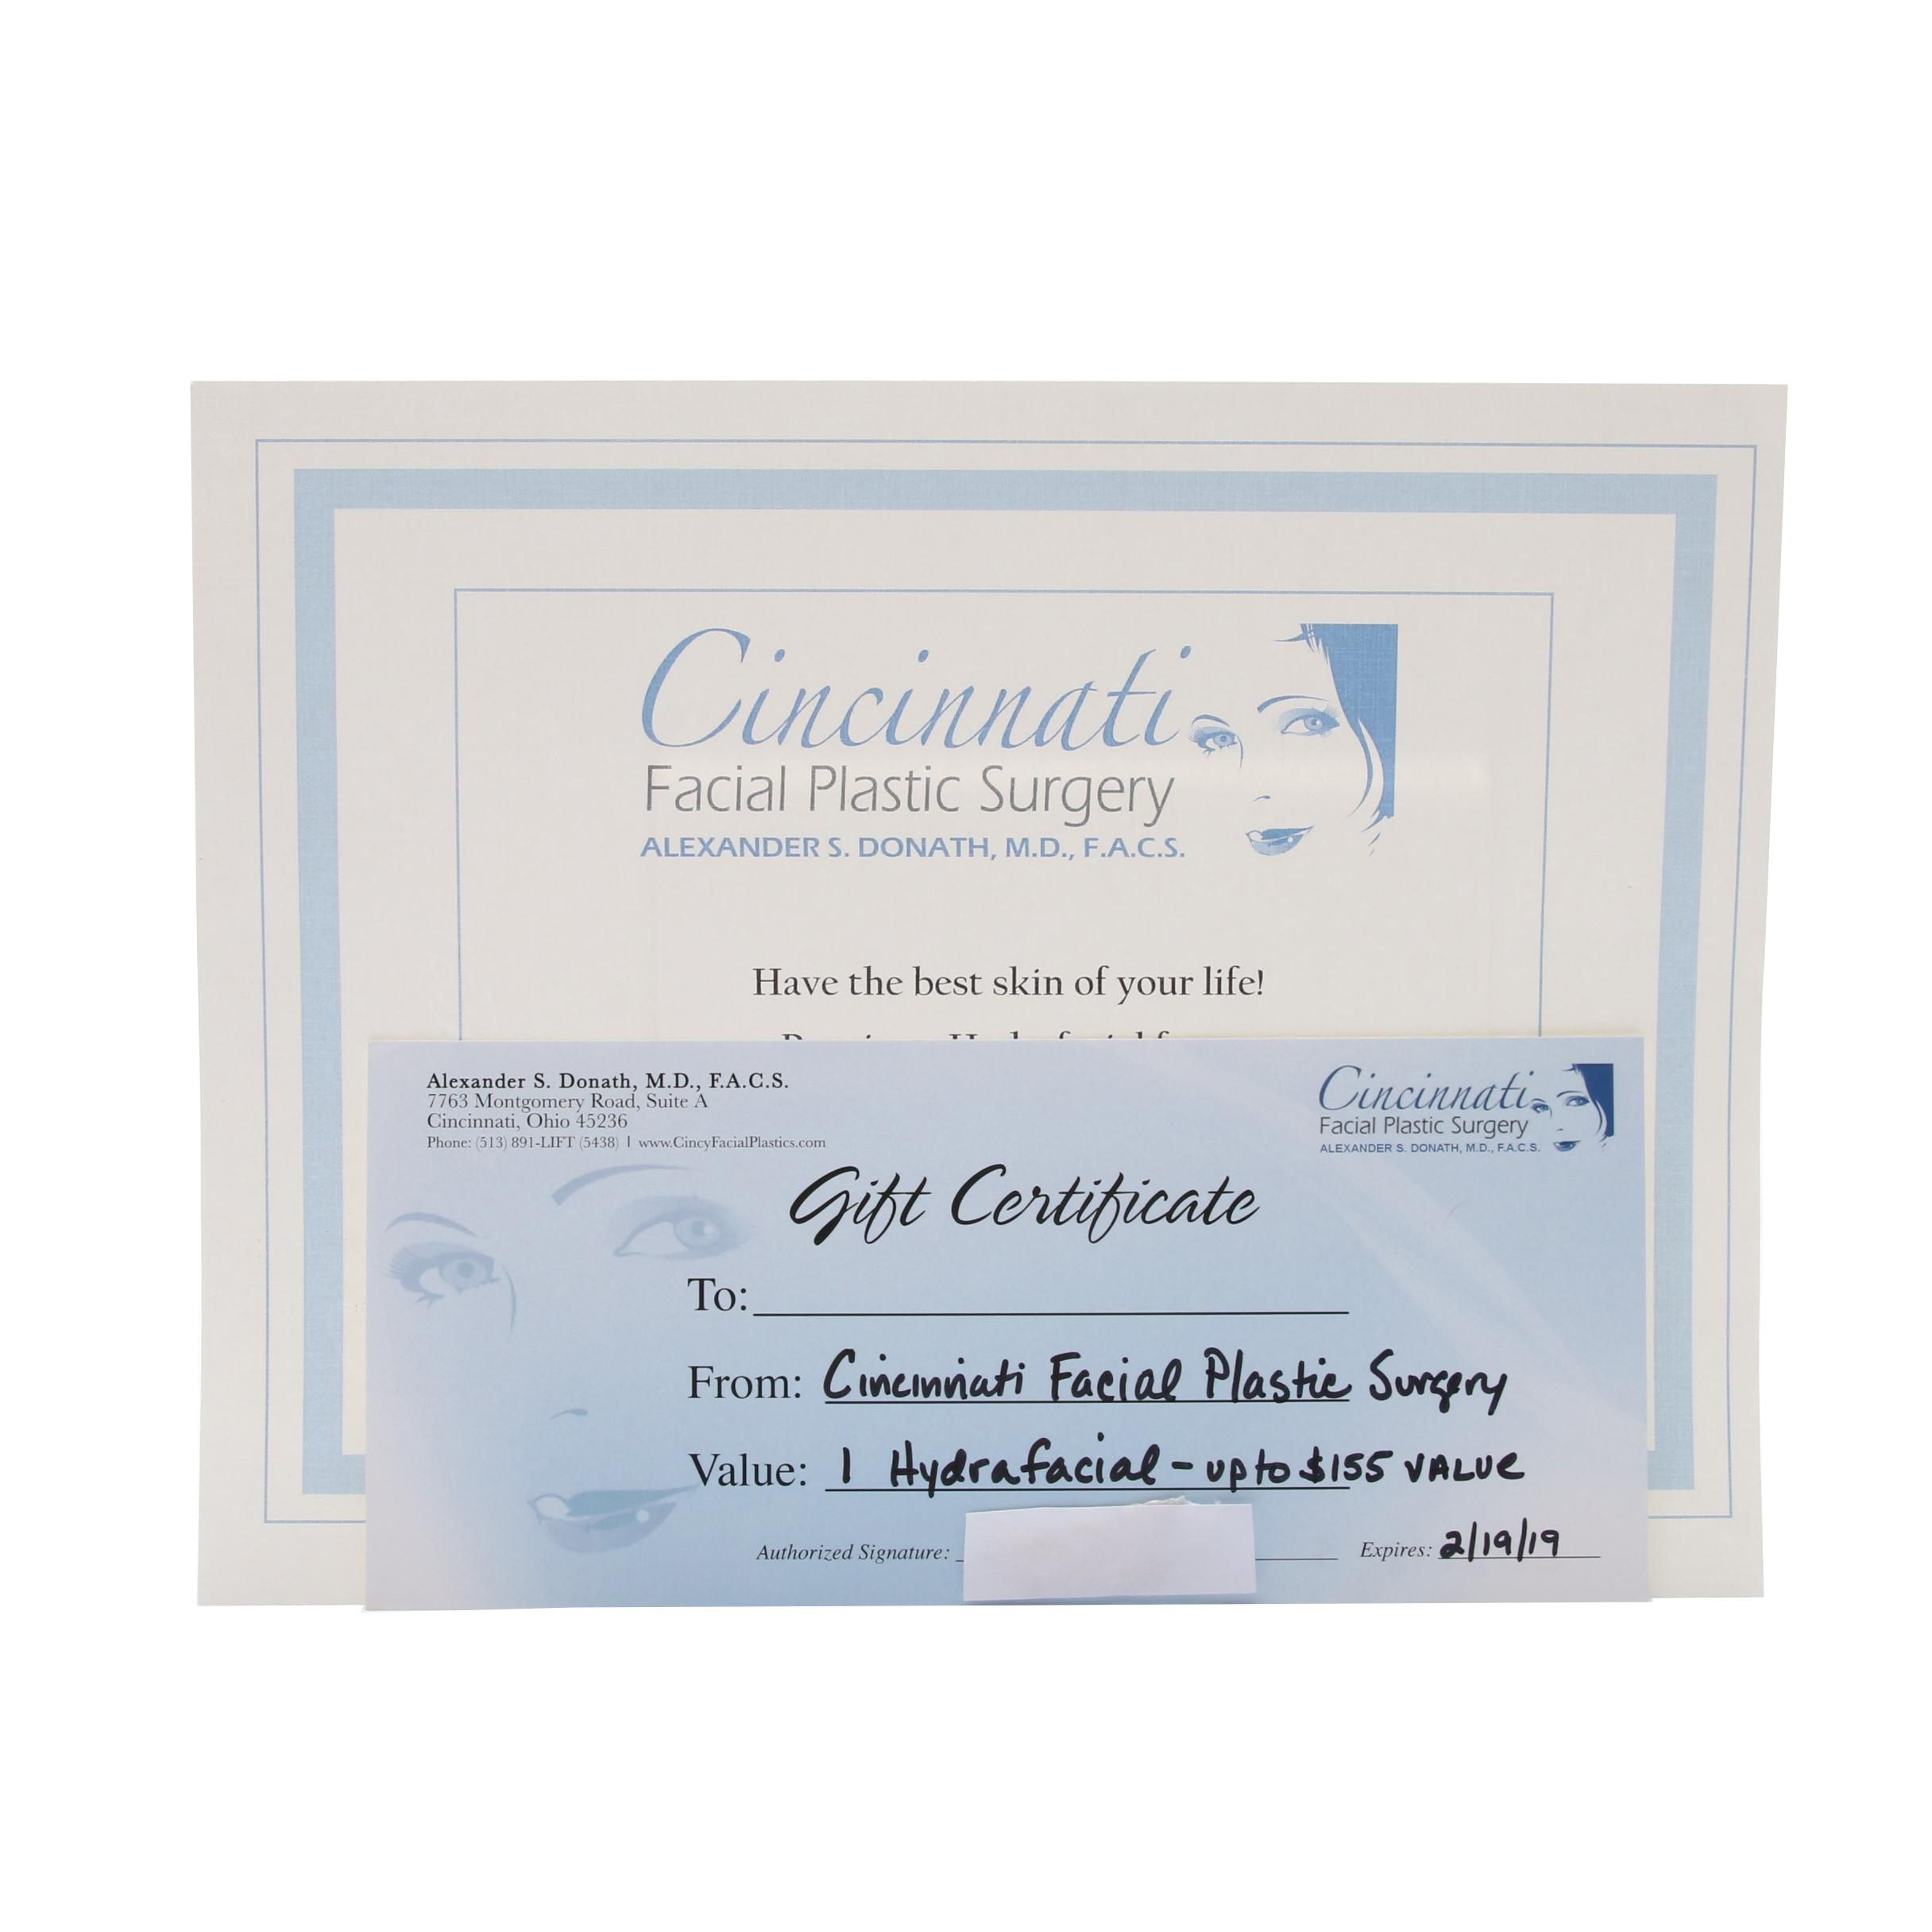 Cincinnati Facial Plastic Surgery HydraFacial Gift Certificate